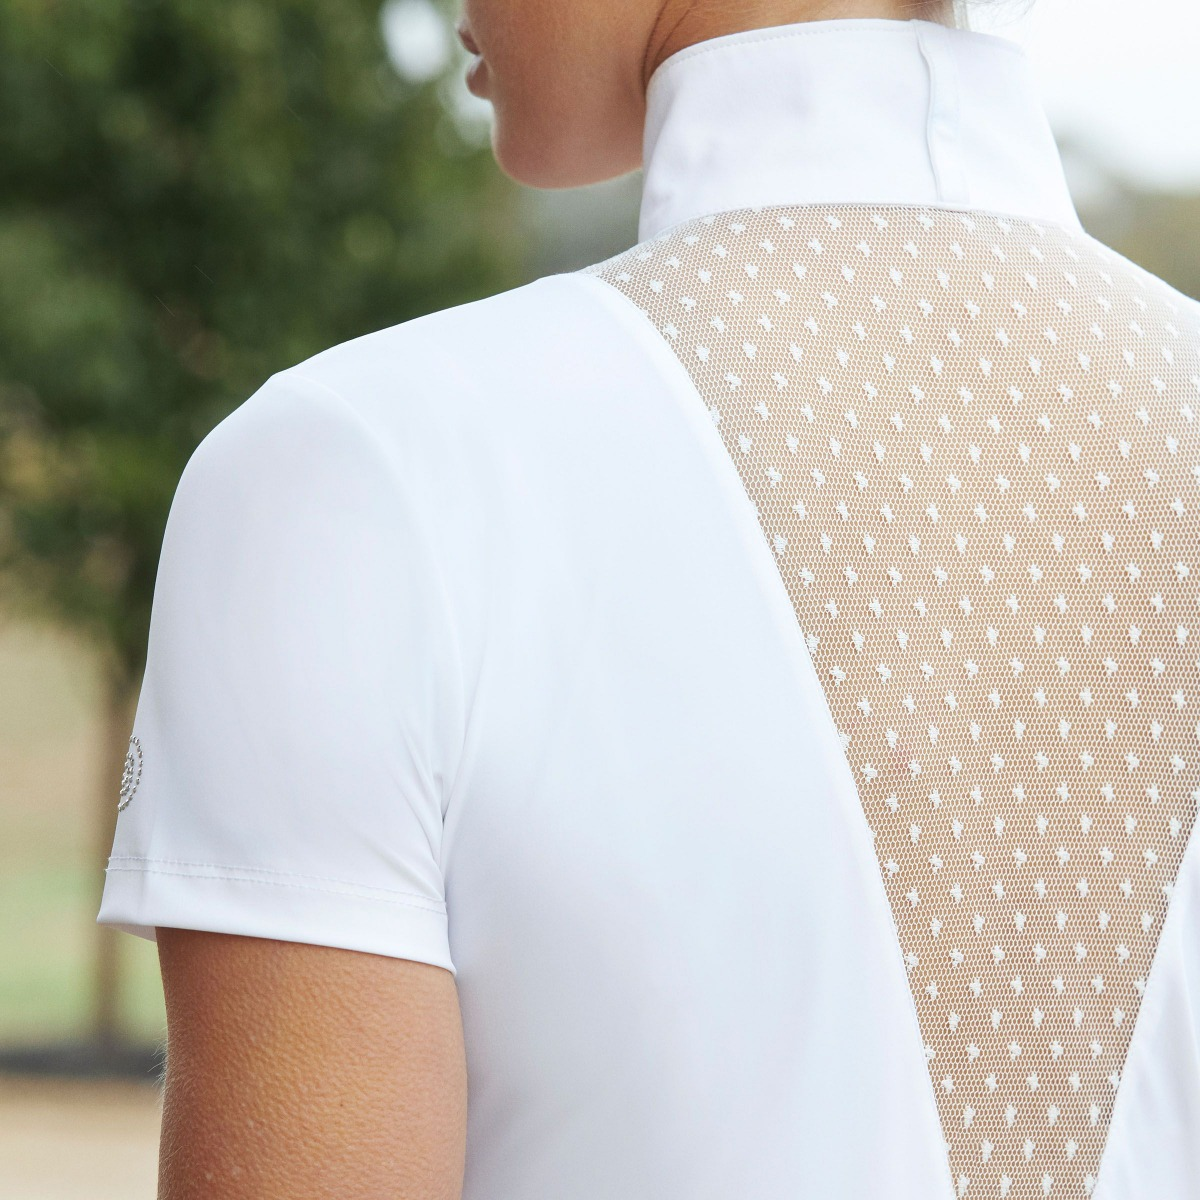 dublin tara lace competition shirt